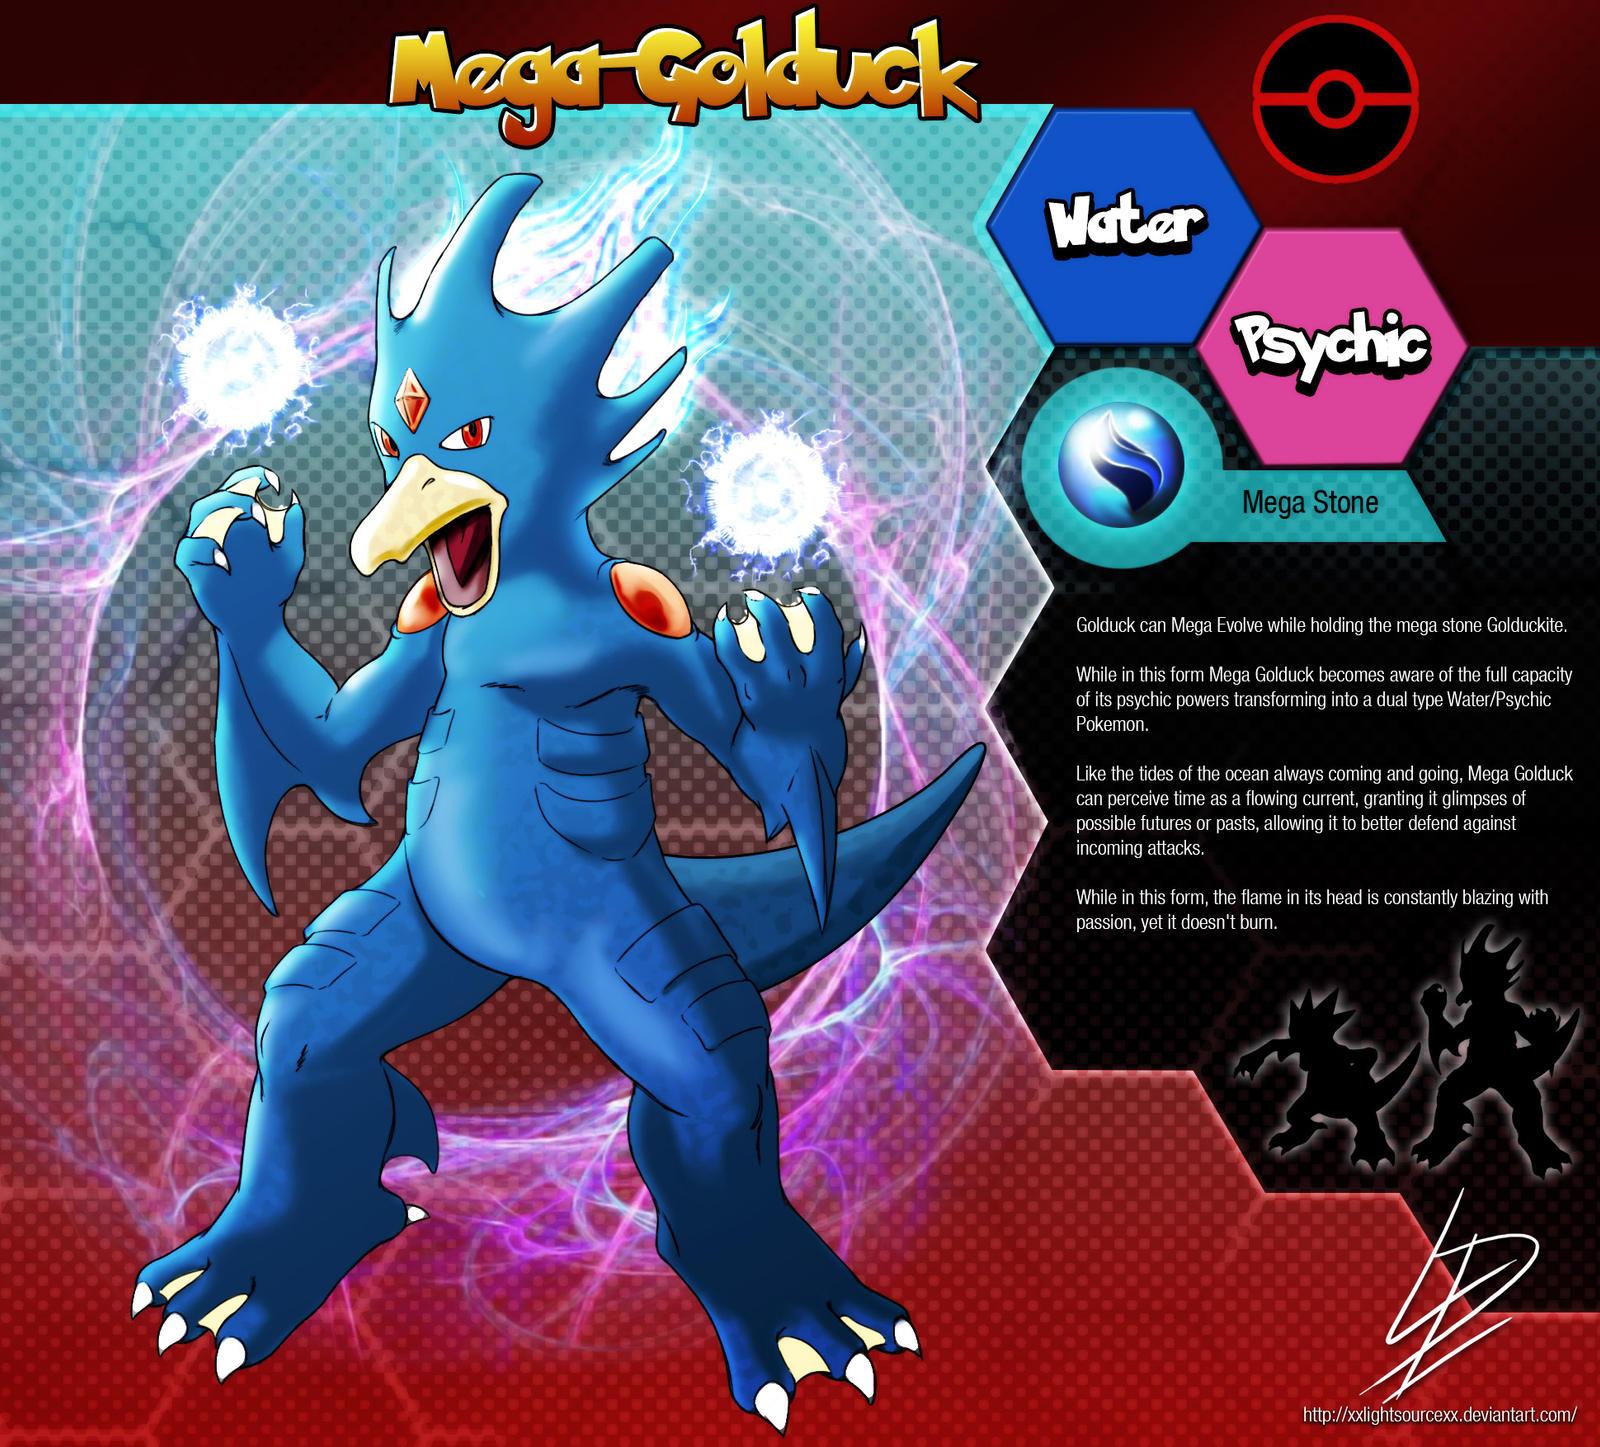 Mega golduck pokemon fan evolution concept by - Pokemon tortank mega evolution ...